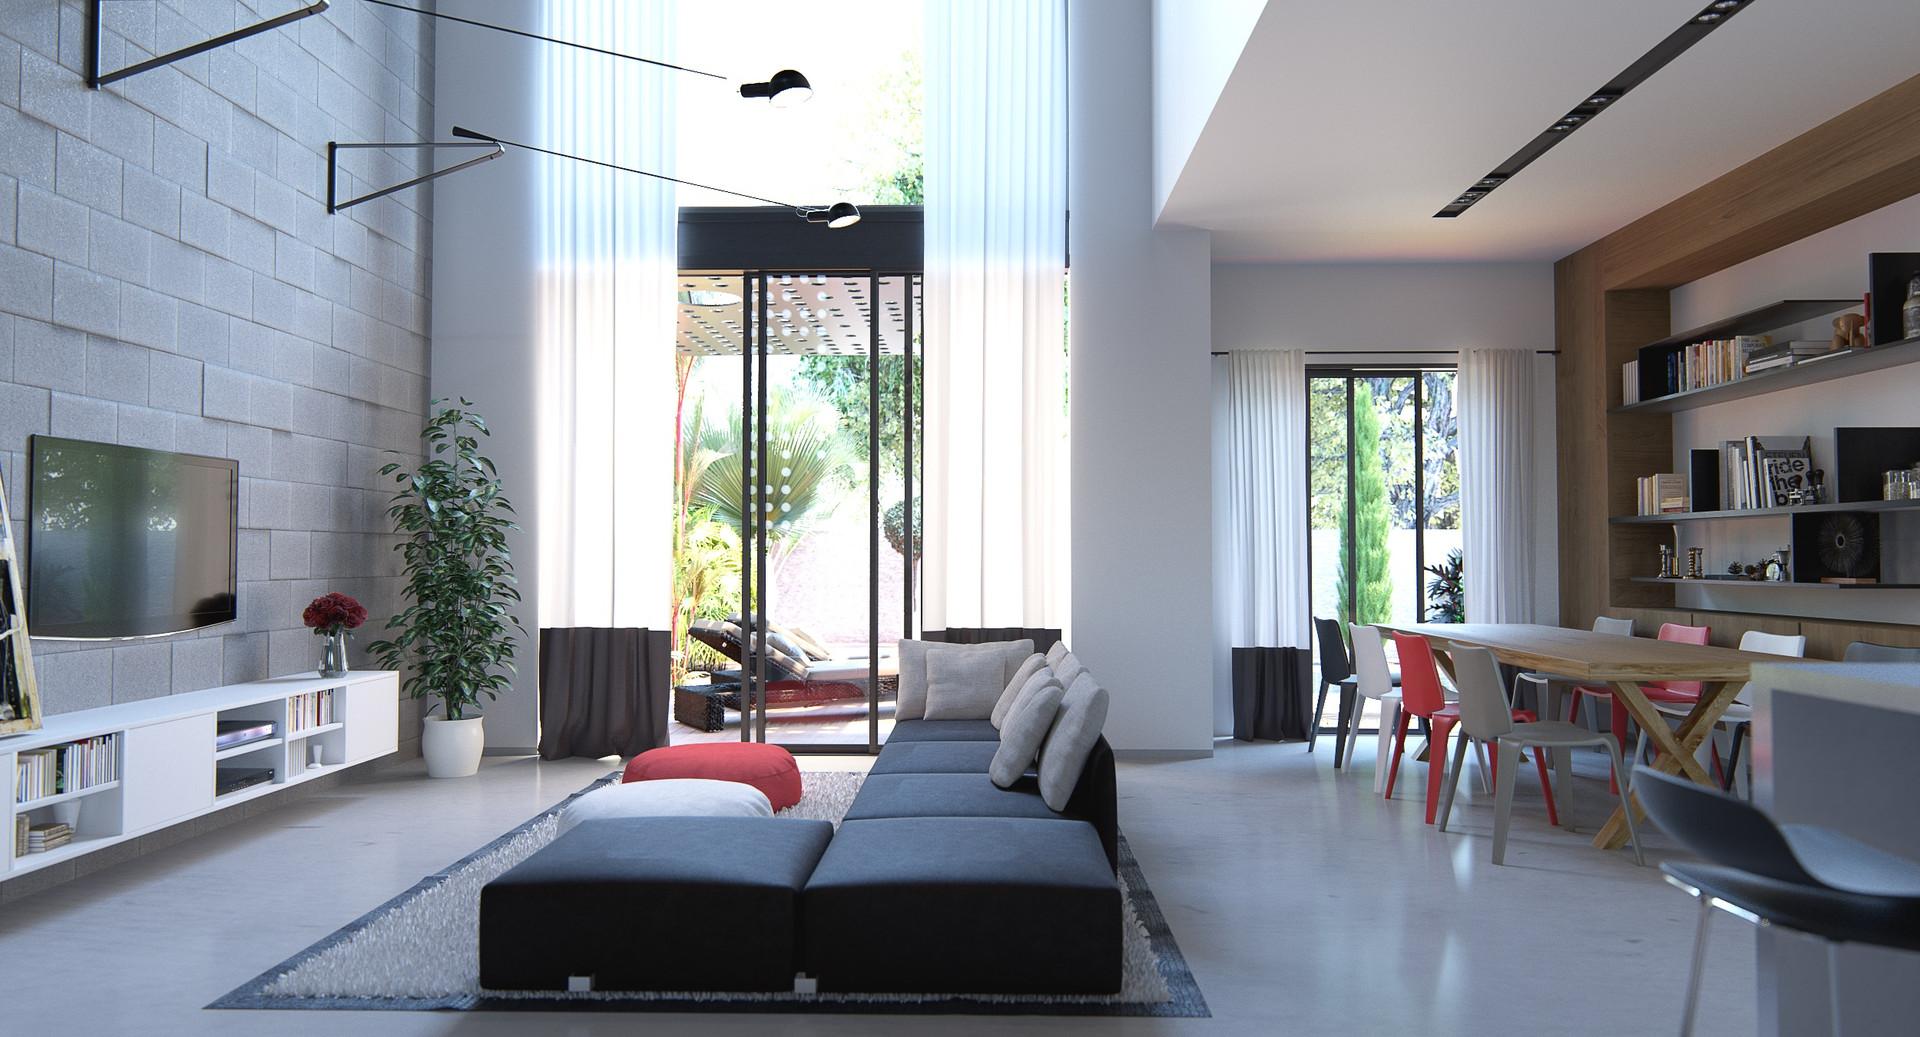 interior_5 - עותק.jpg